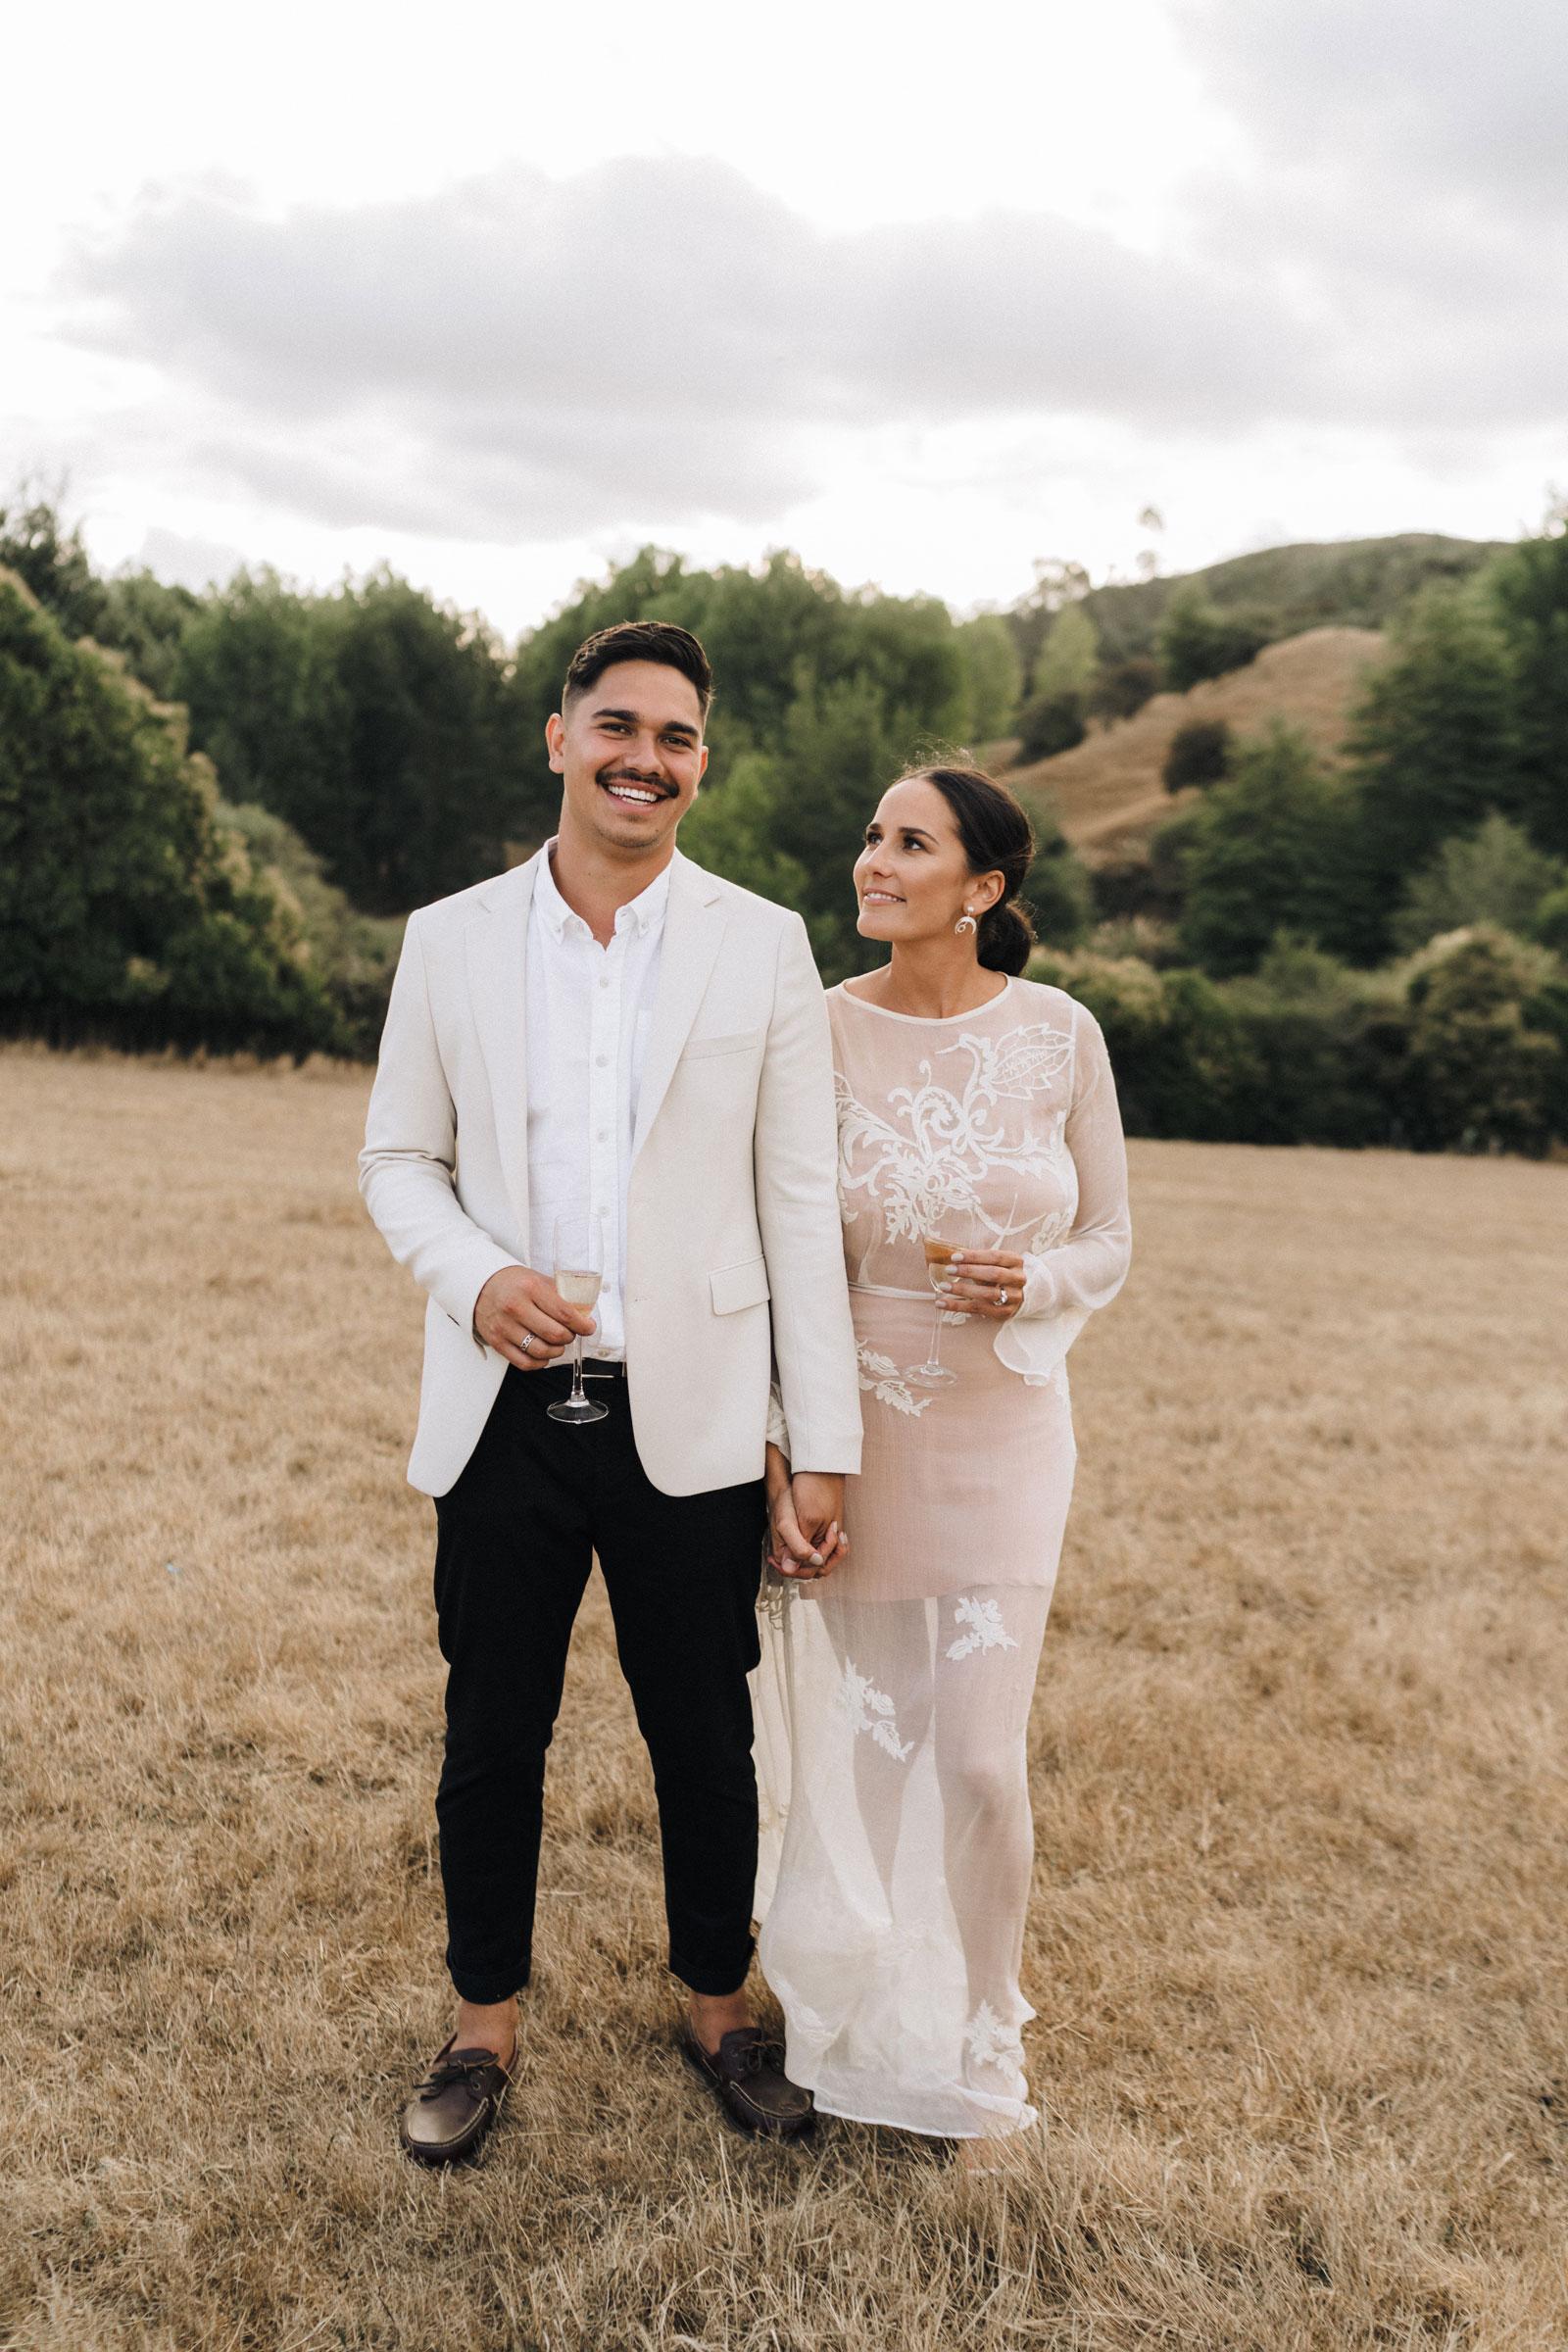 newfound-s-t-hunua-auckland-wedding-photographers-110